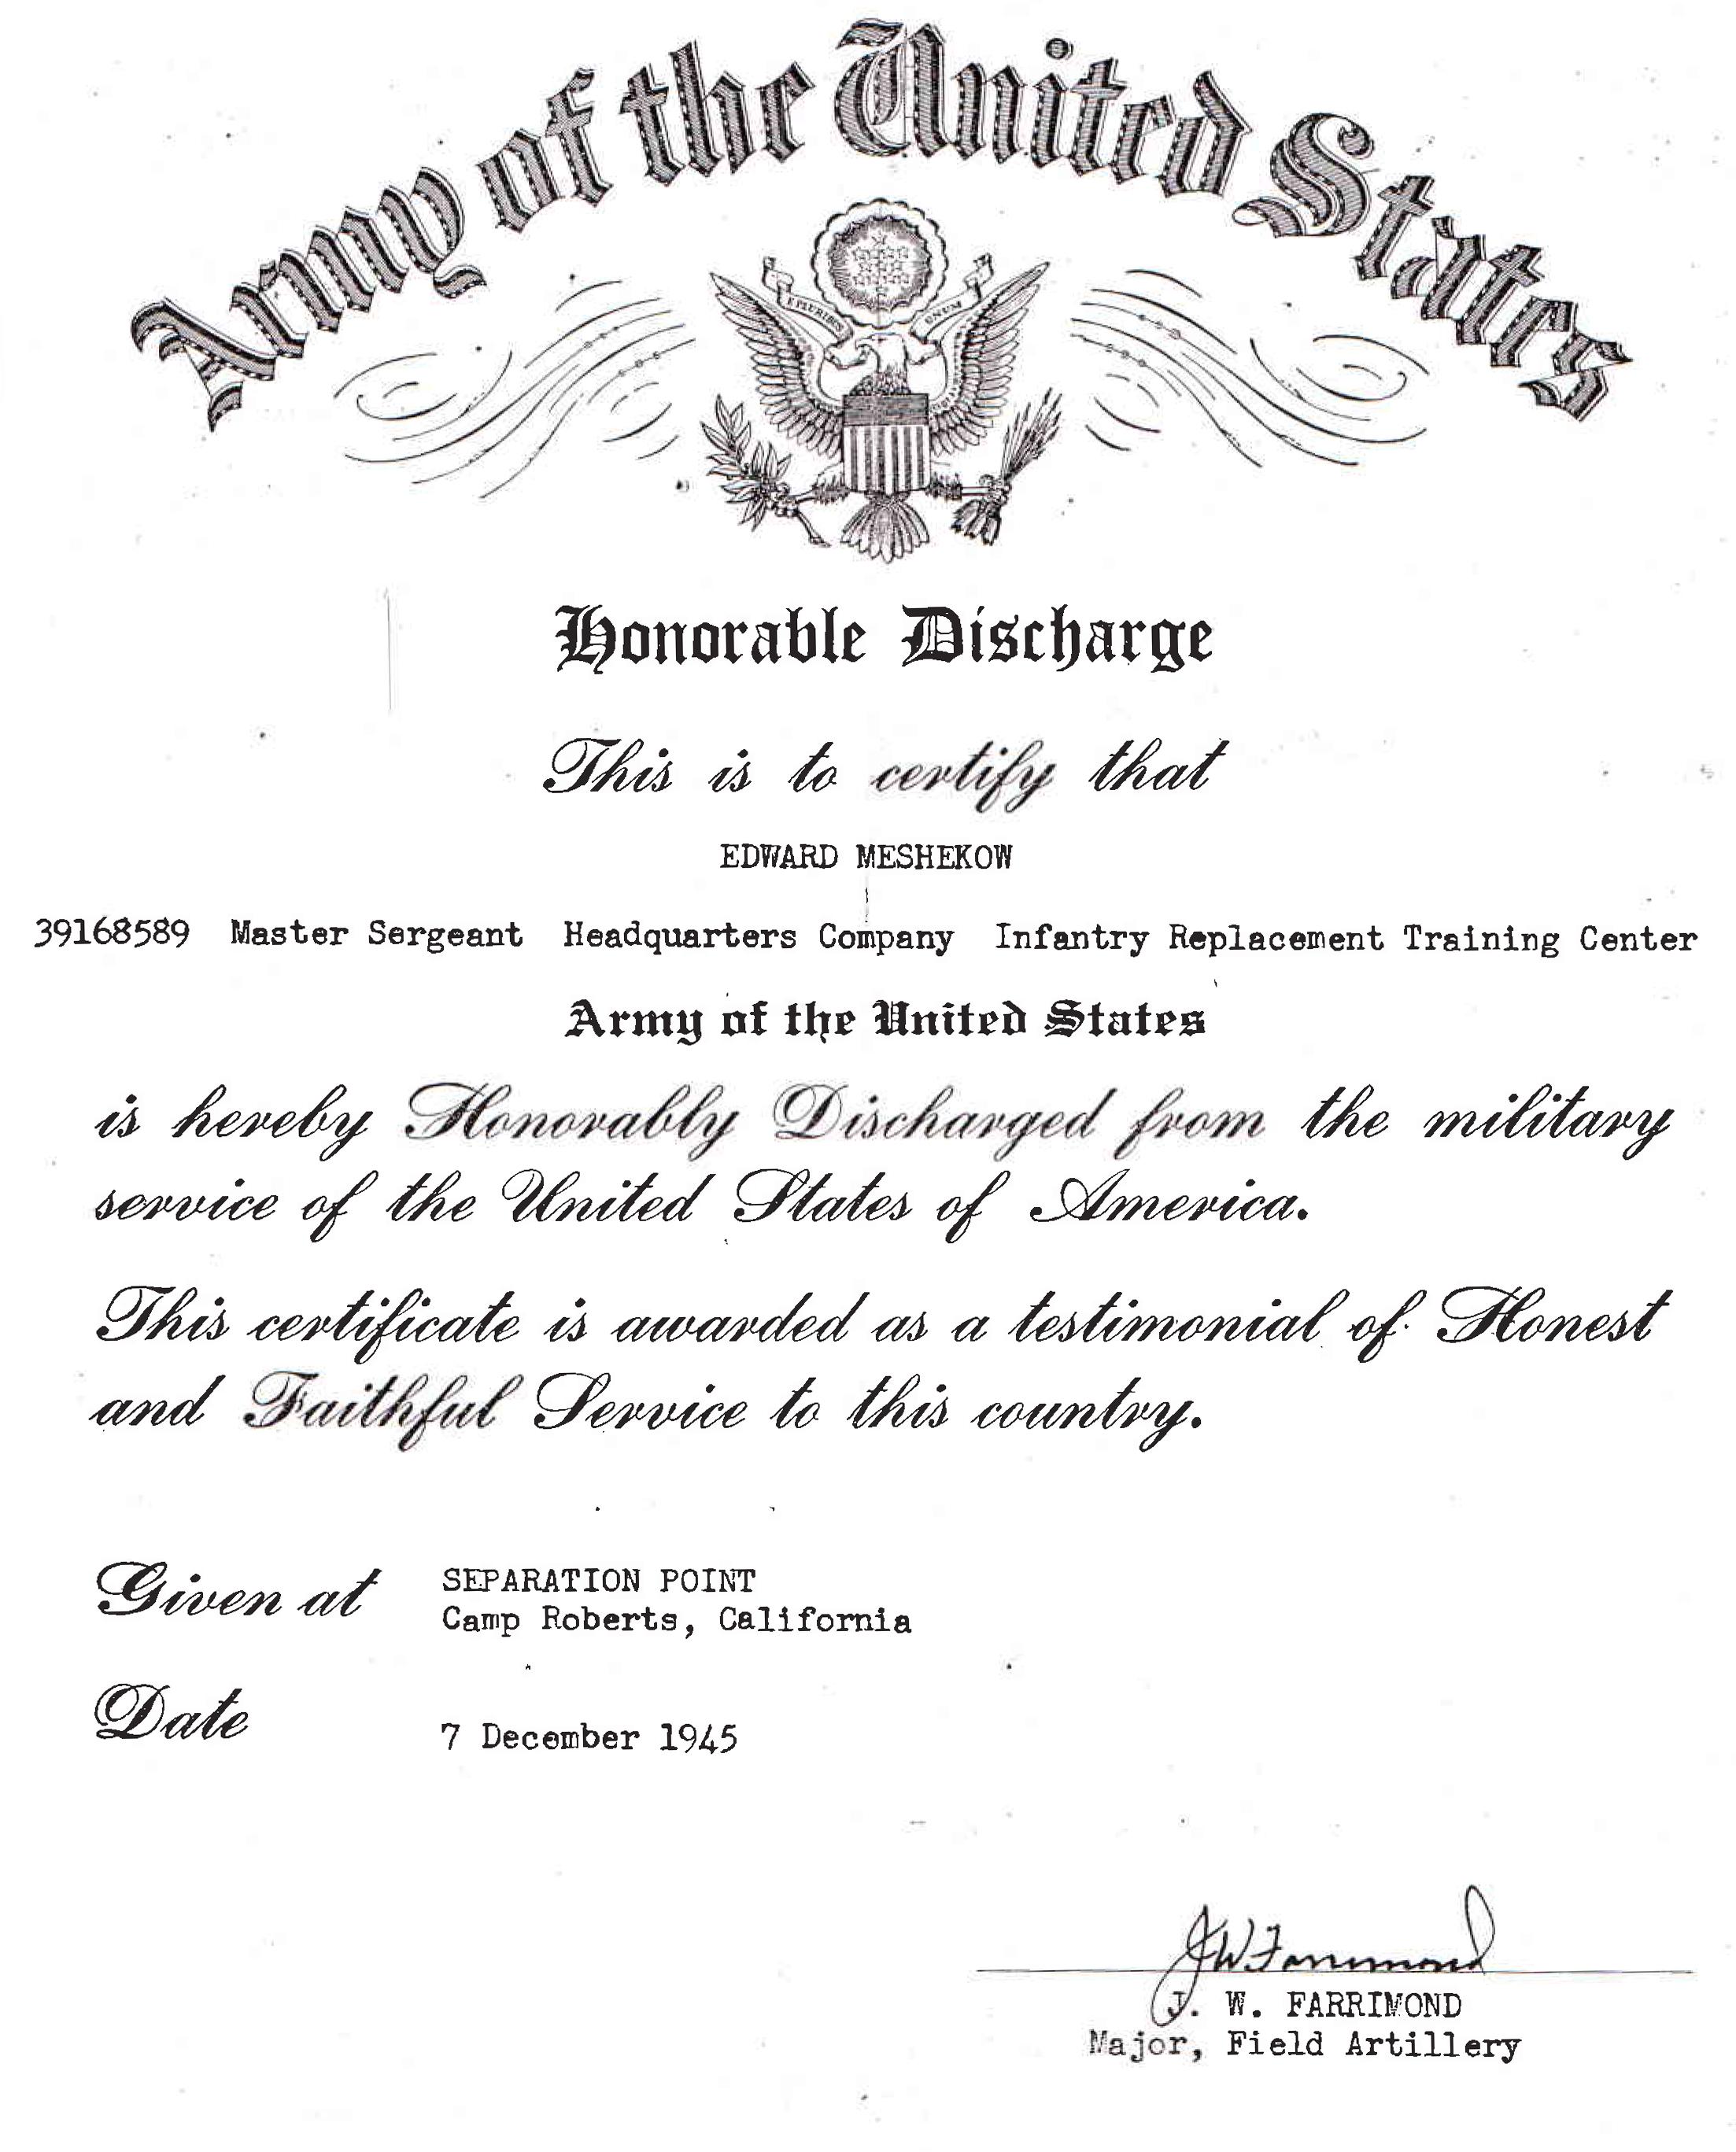 discharge papers.jpg